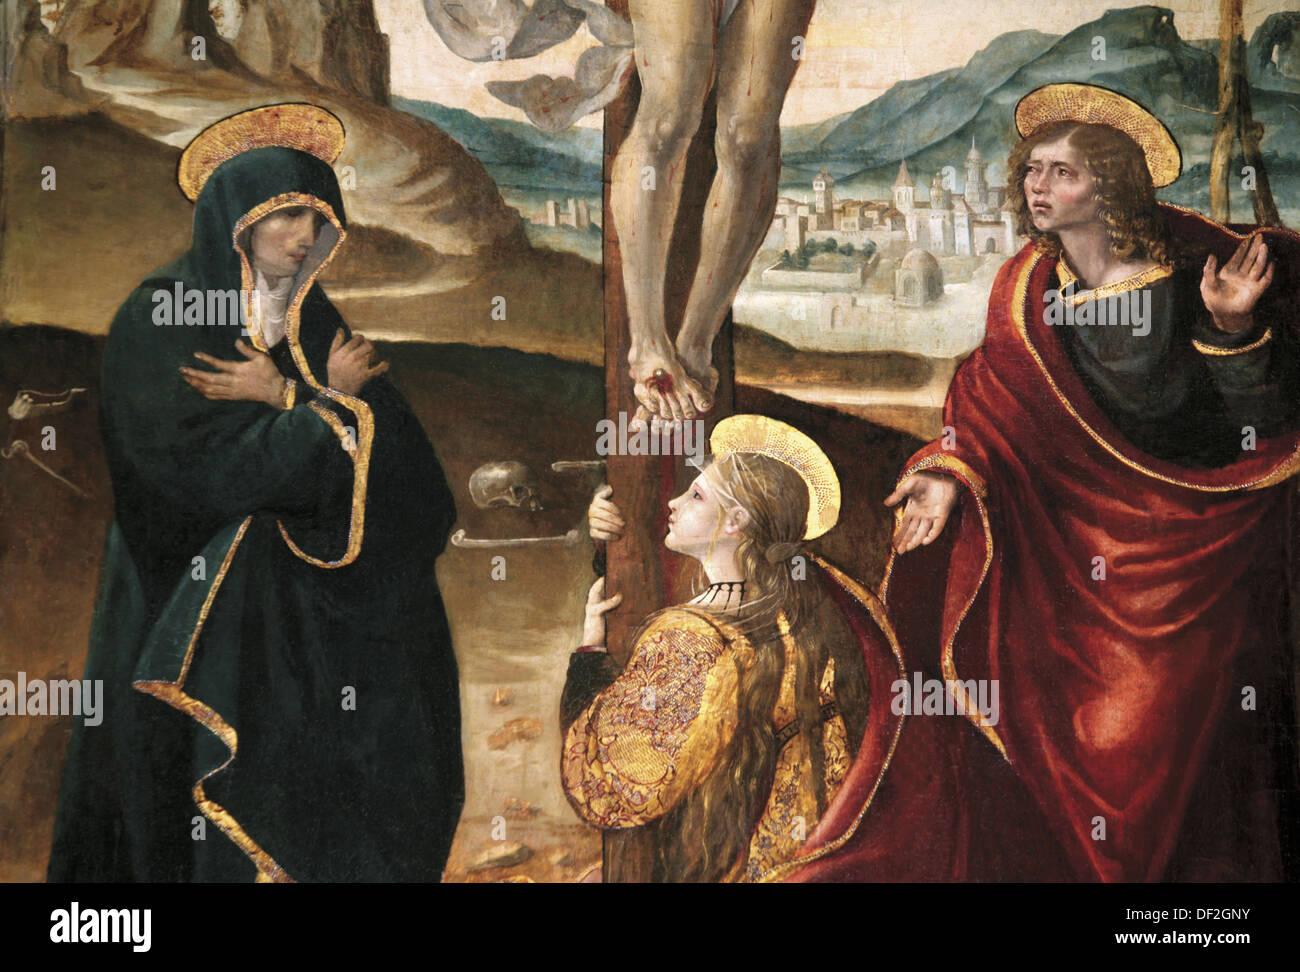 virgin mary mary magdalena and saint john at the feets of jesus